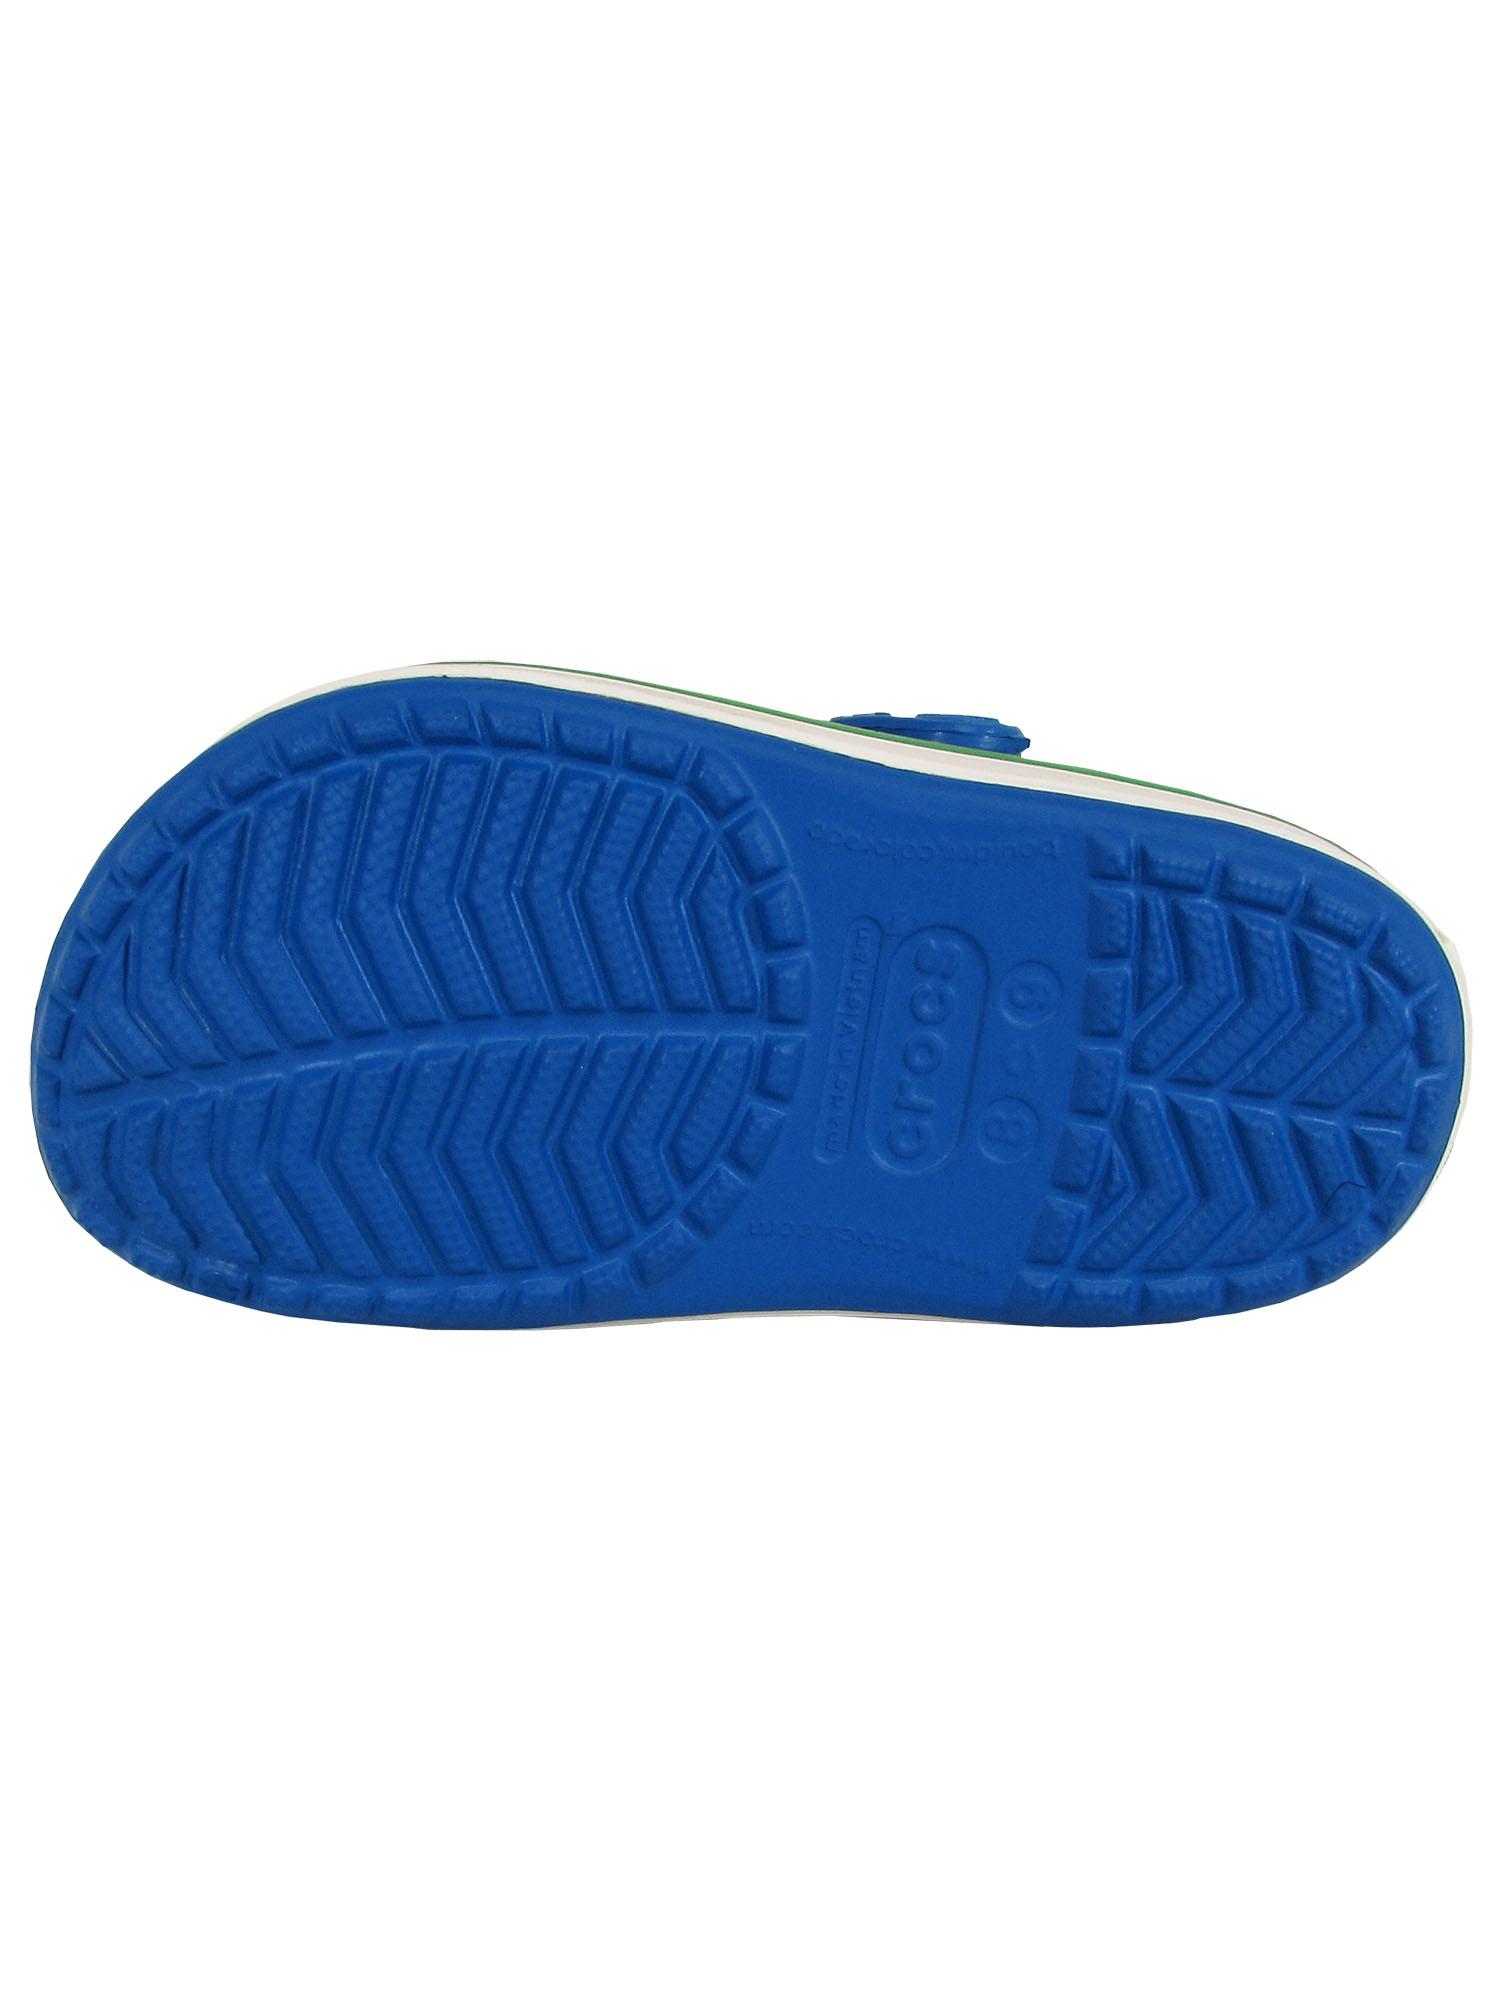 Crocs-Crocband-Kids-Slip-On-Clog-Shoes thumbnail 15